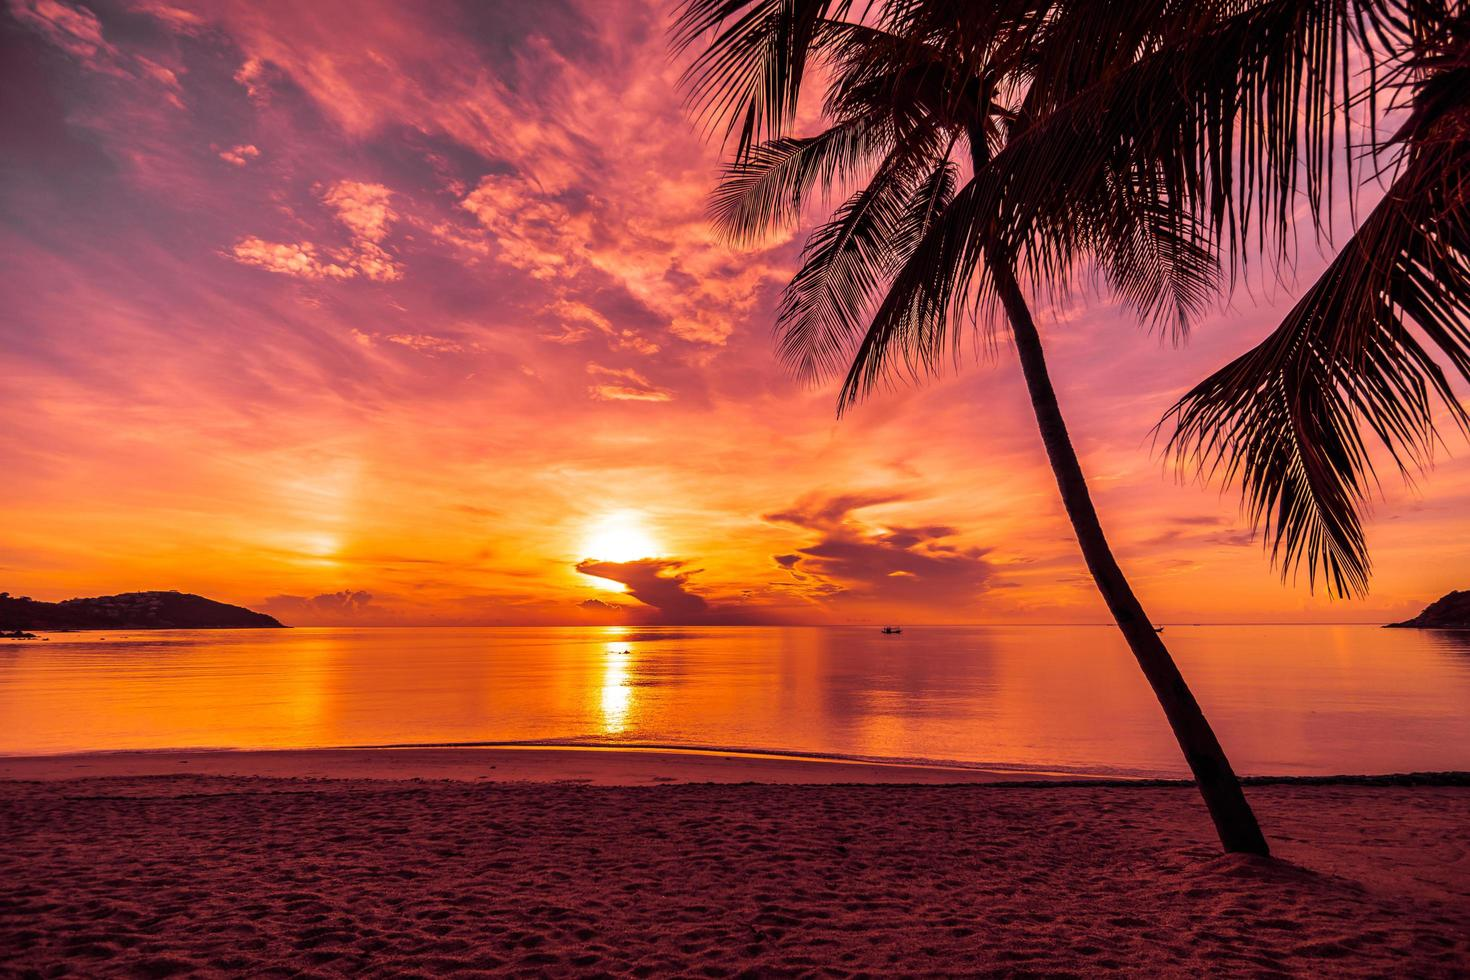 Sunset on the tropical beach photo